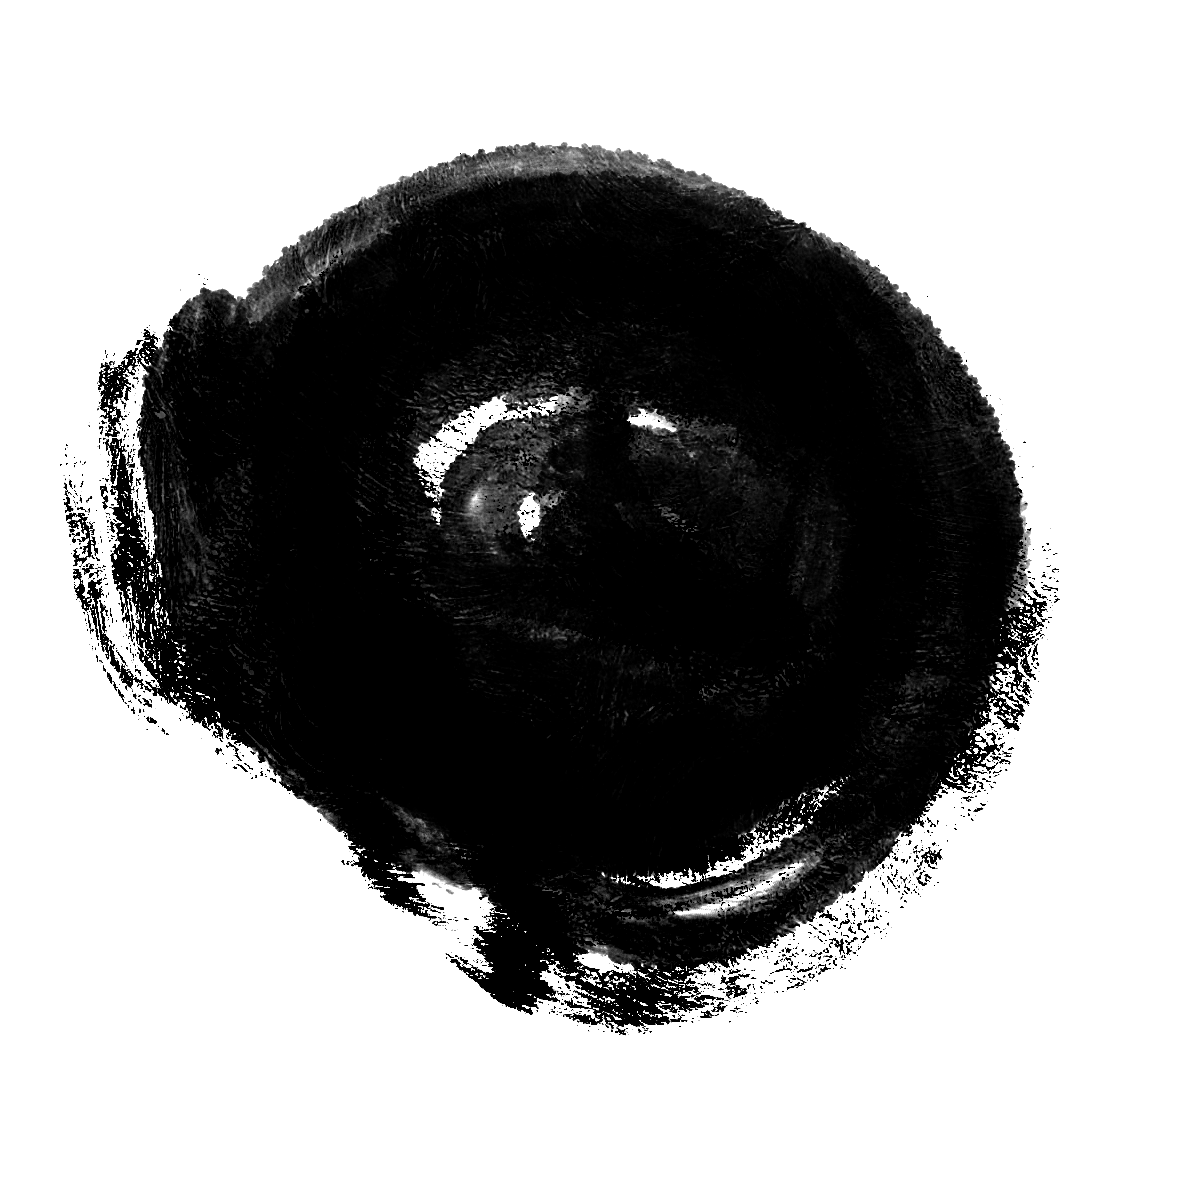 ANTOINETTE PIENAAR